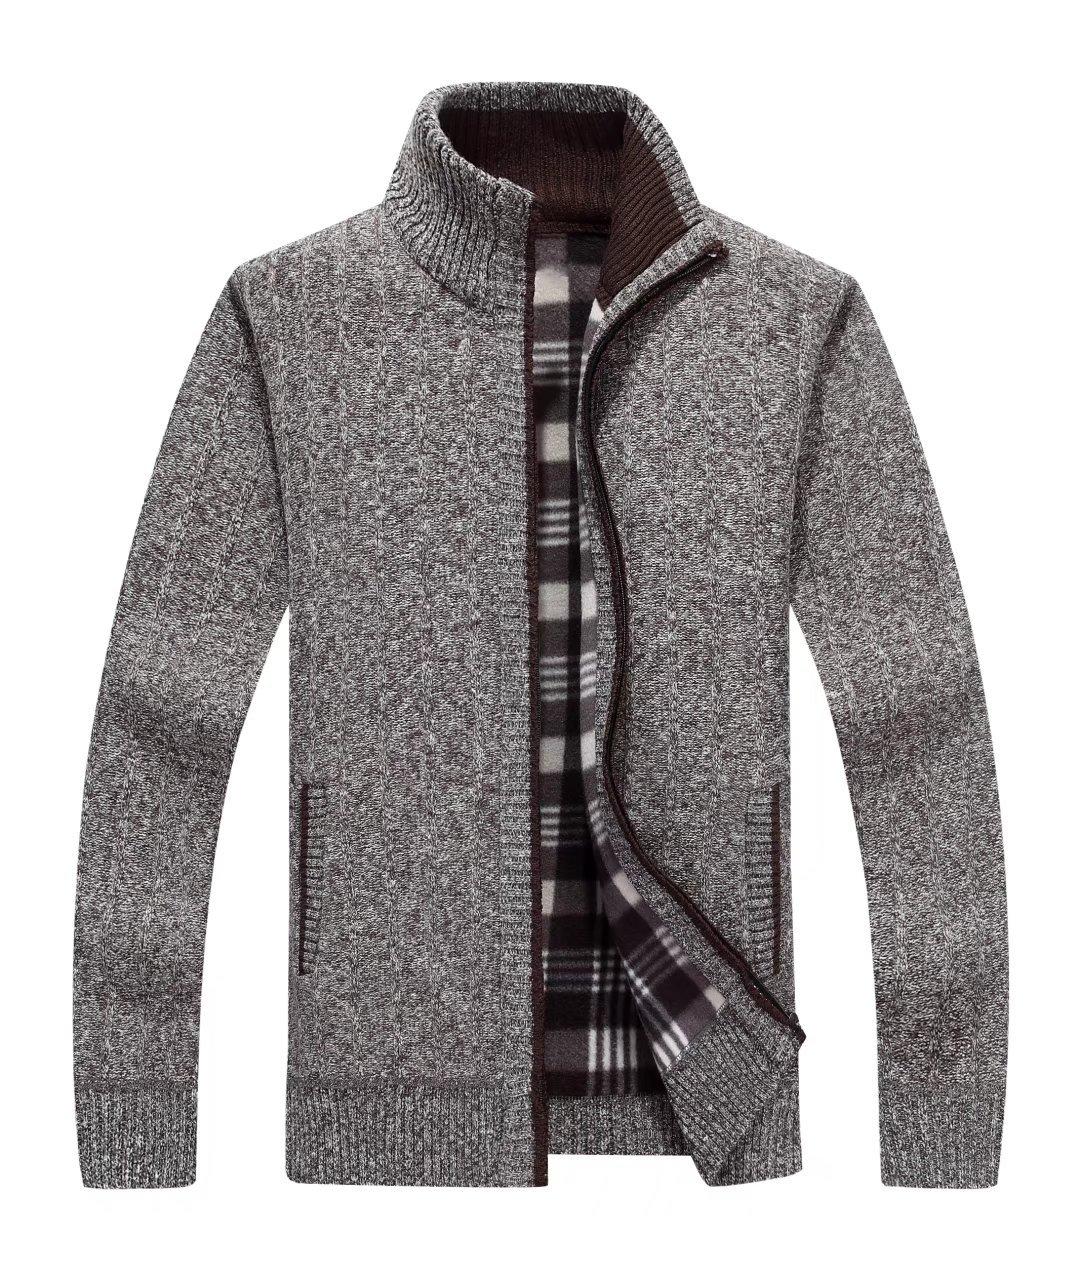 Msmsse Men's Zip Knitted Cardigan Sweater Coffee L